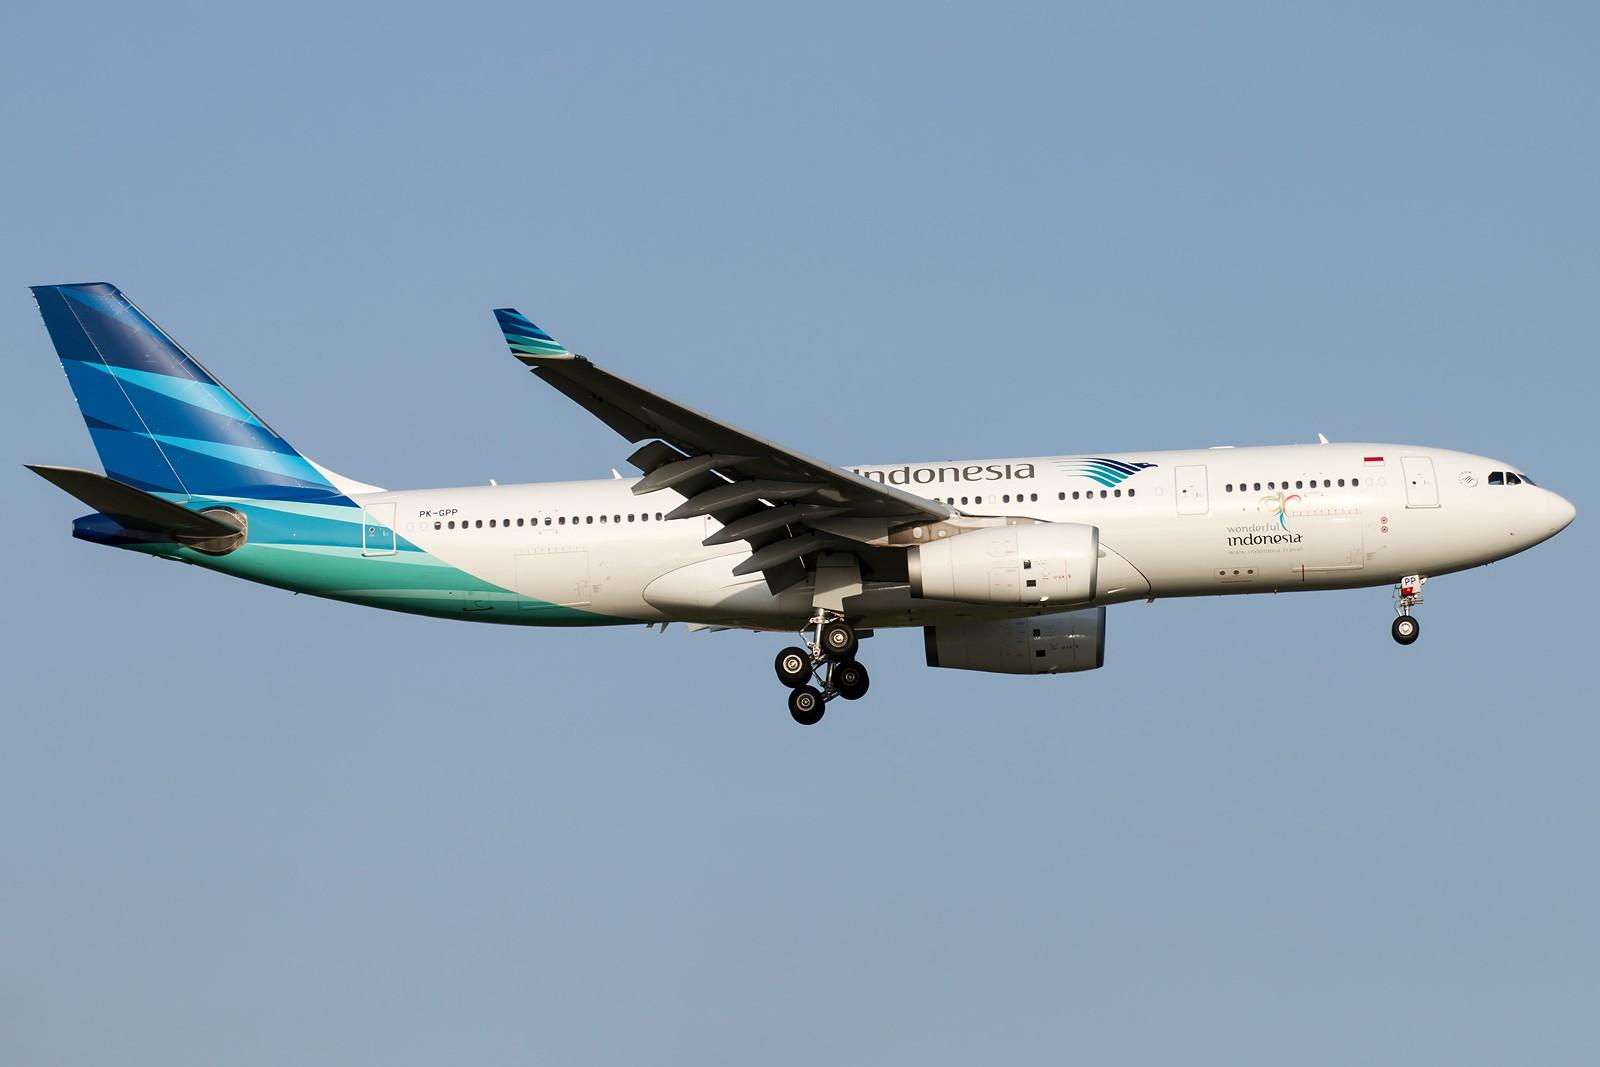 Re:[原创]晨练的季节到了 1600*1067 [8pics] AIRBUS A330-243 PK-GPP 中国北京首都国际机场